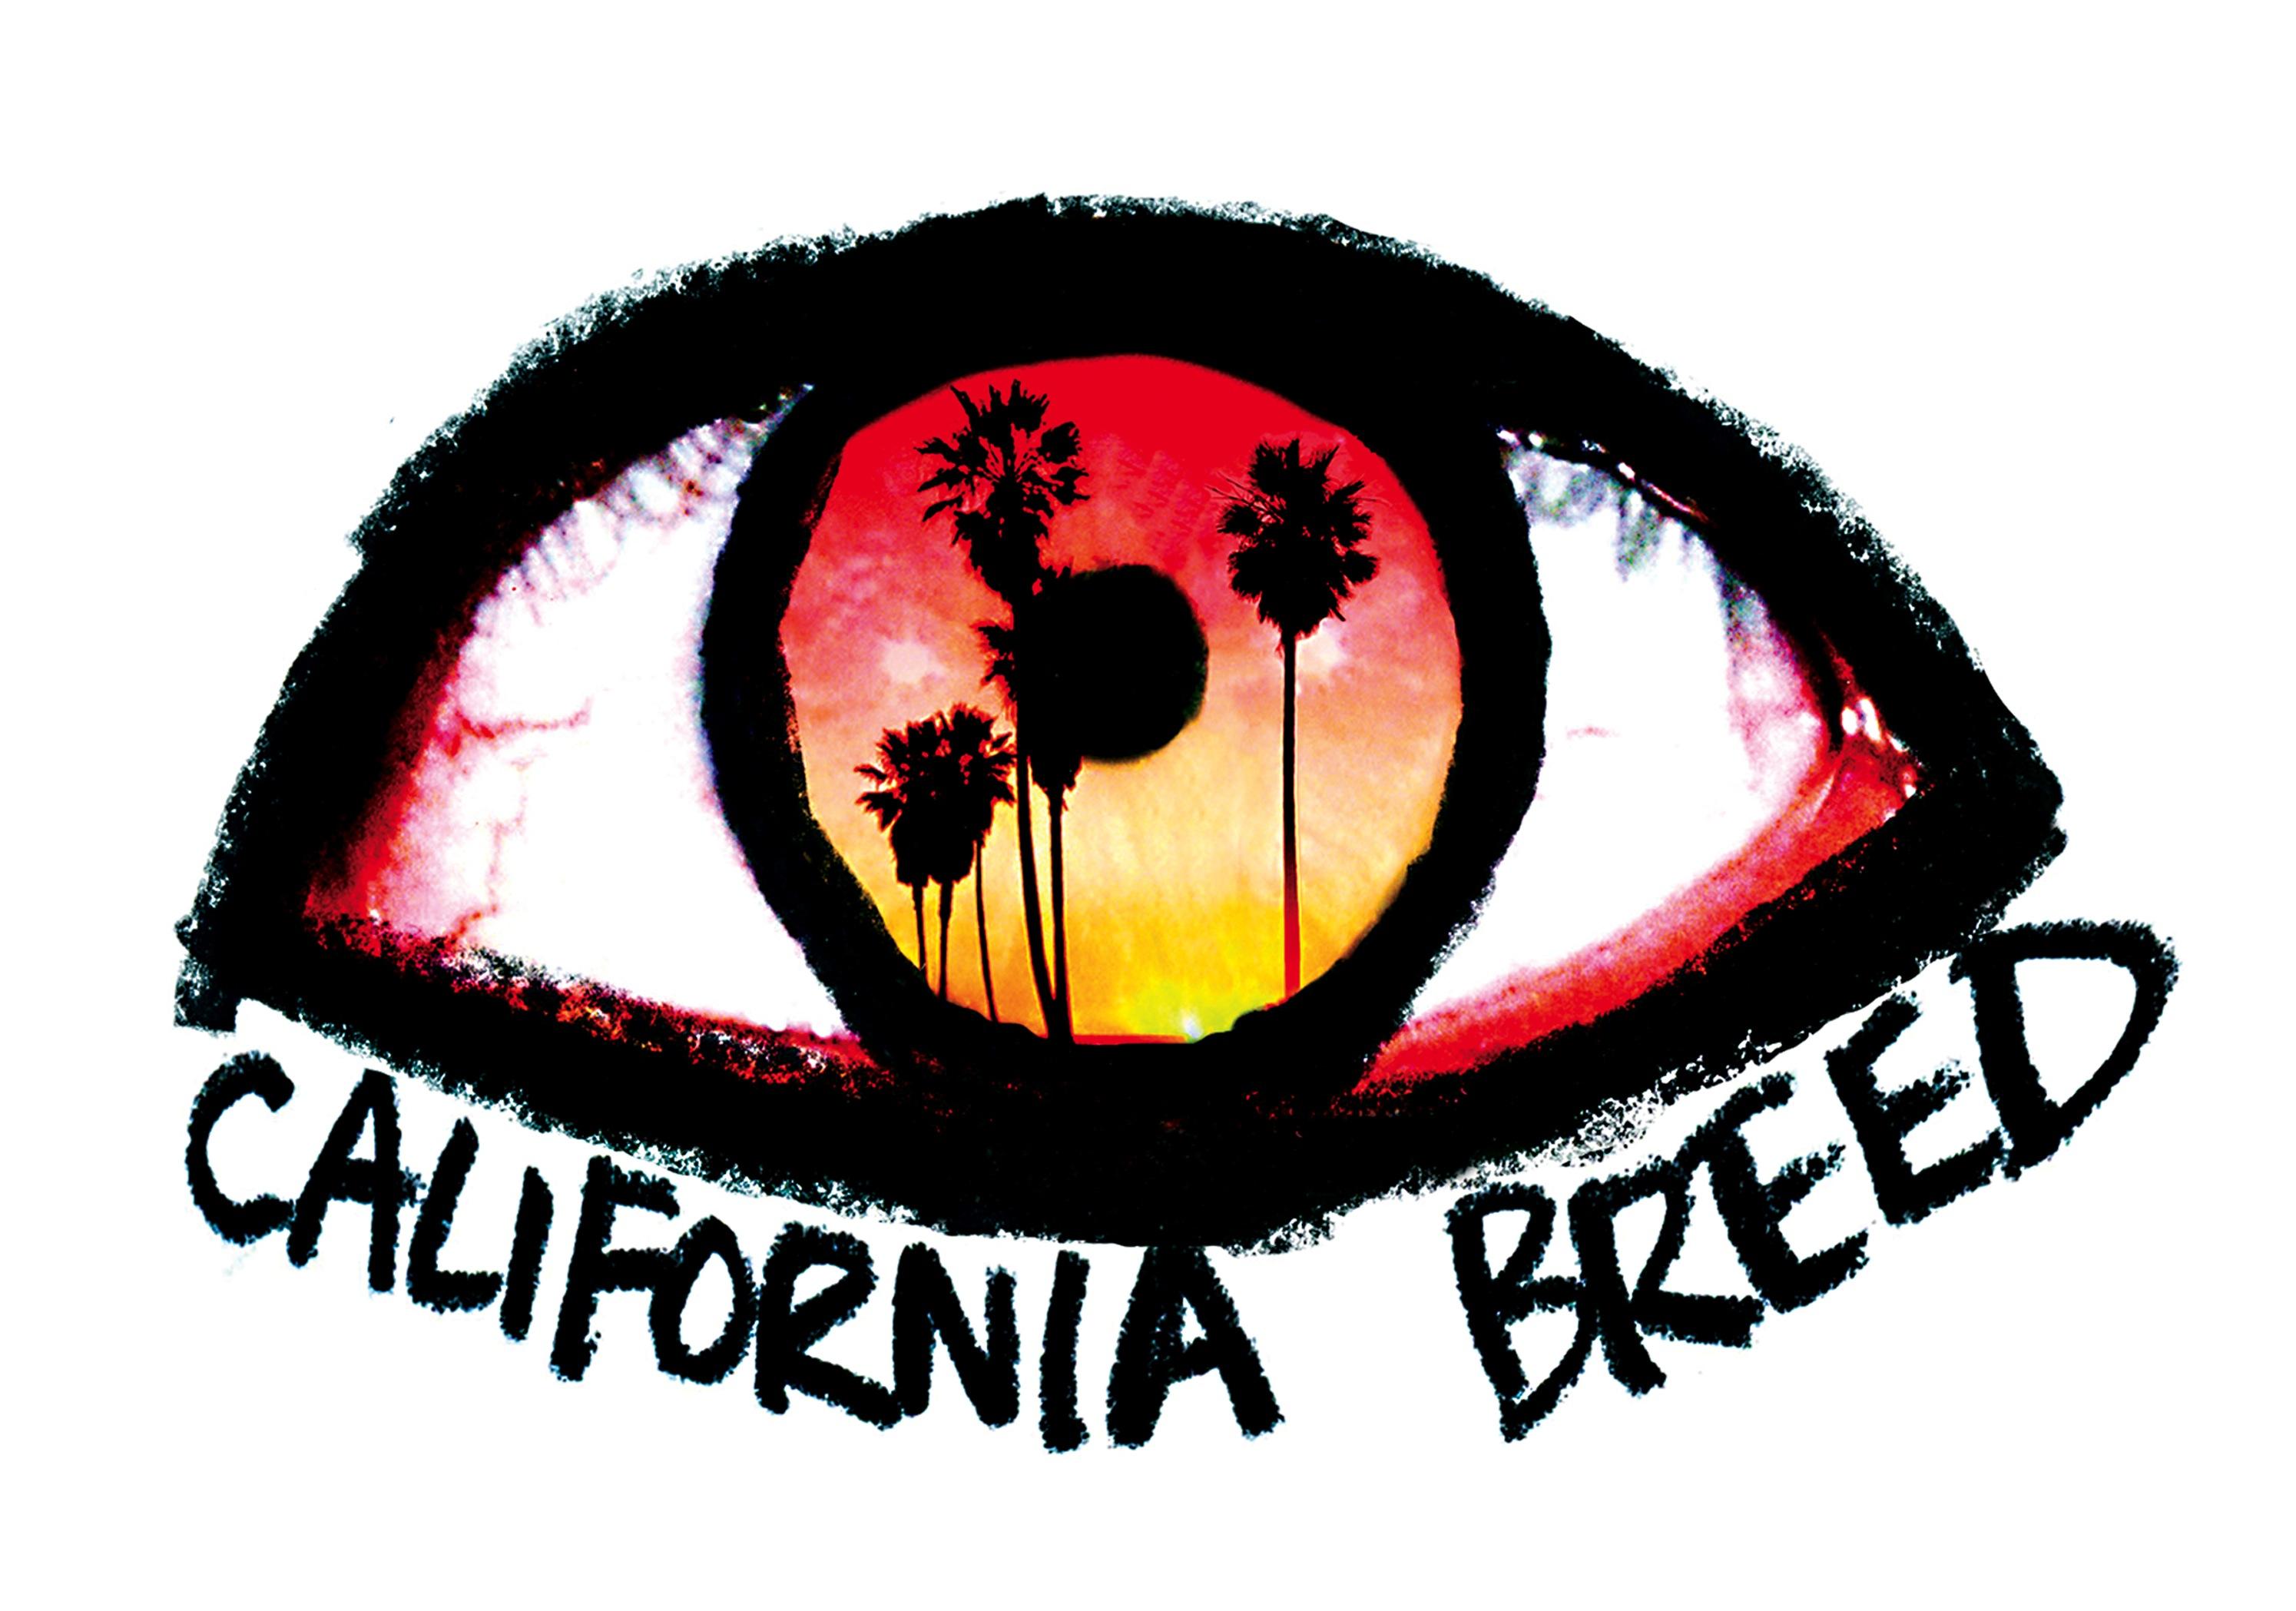 California Breed 648238CaliforniaBreedLogoEye1